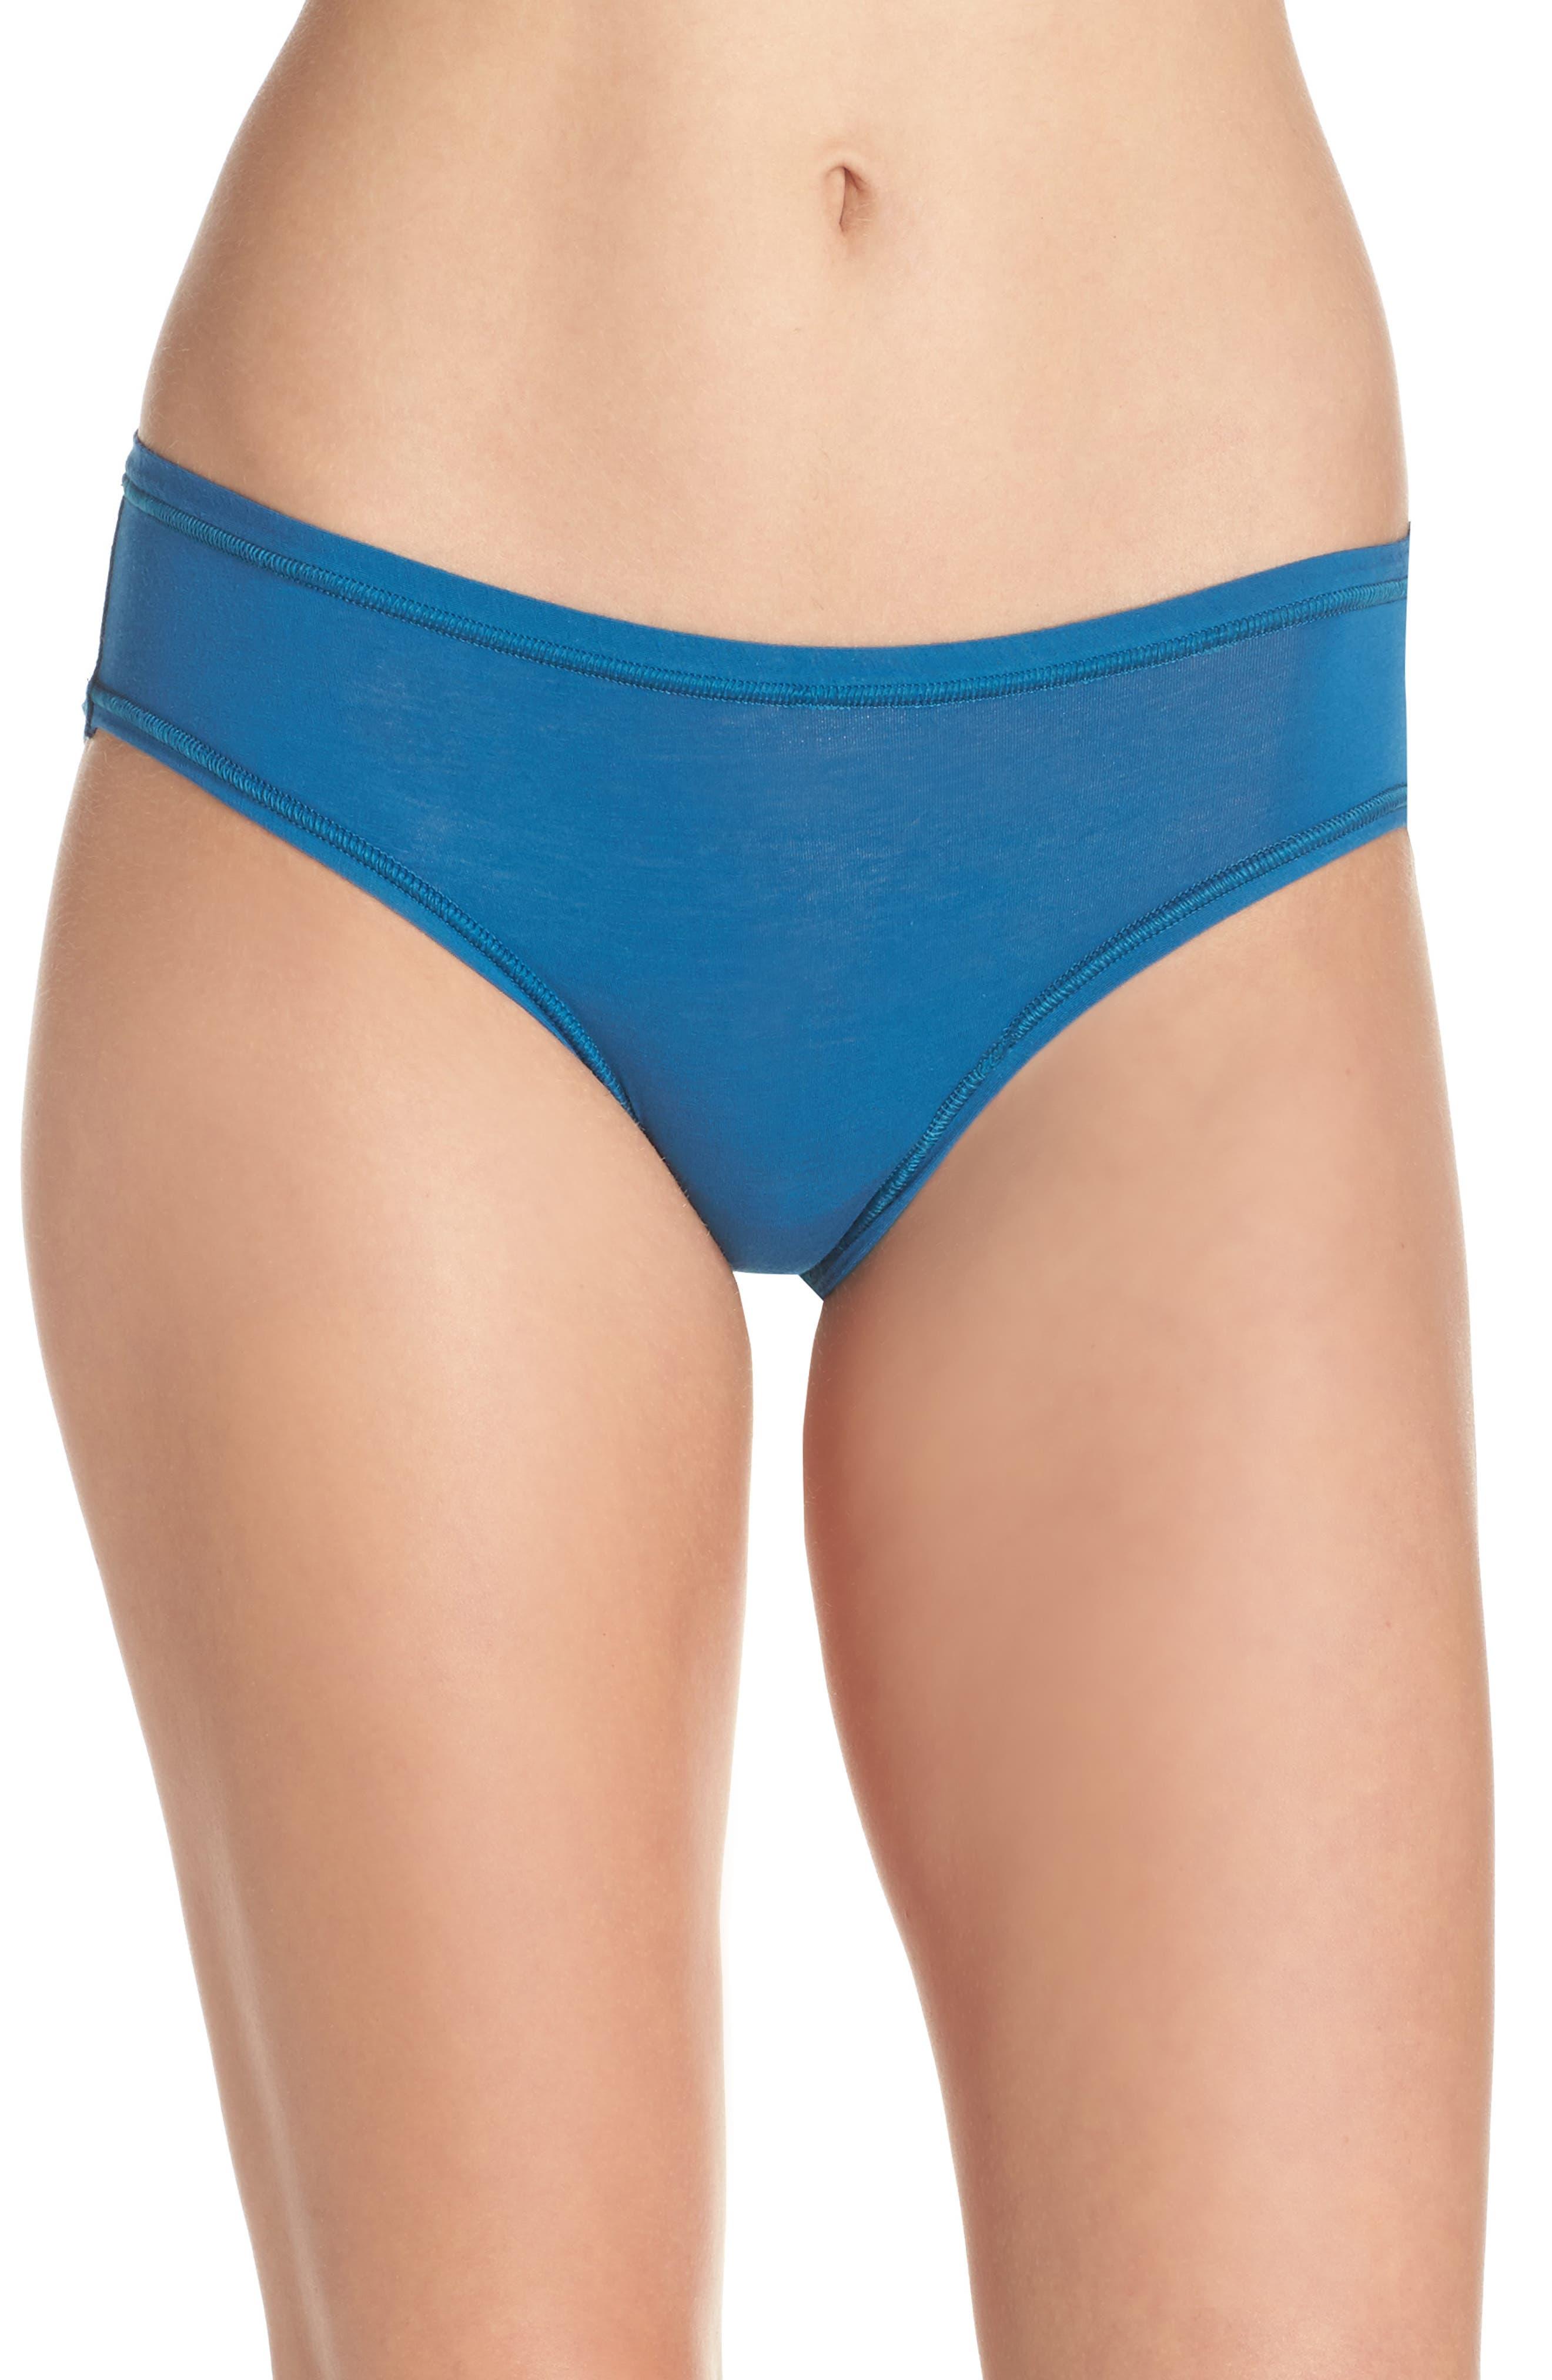 Main Image - Wacoal B Fitting Bikini (3 for $39)